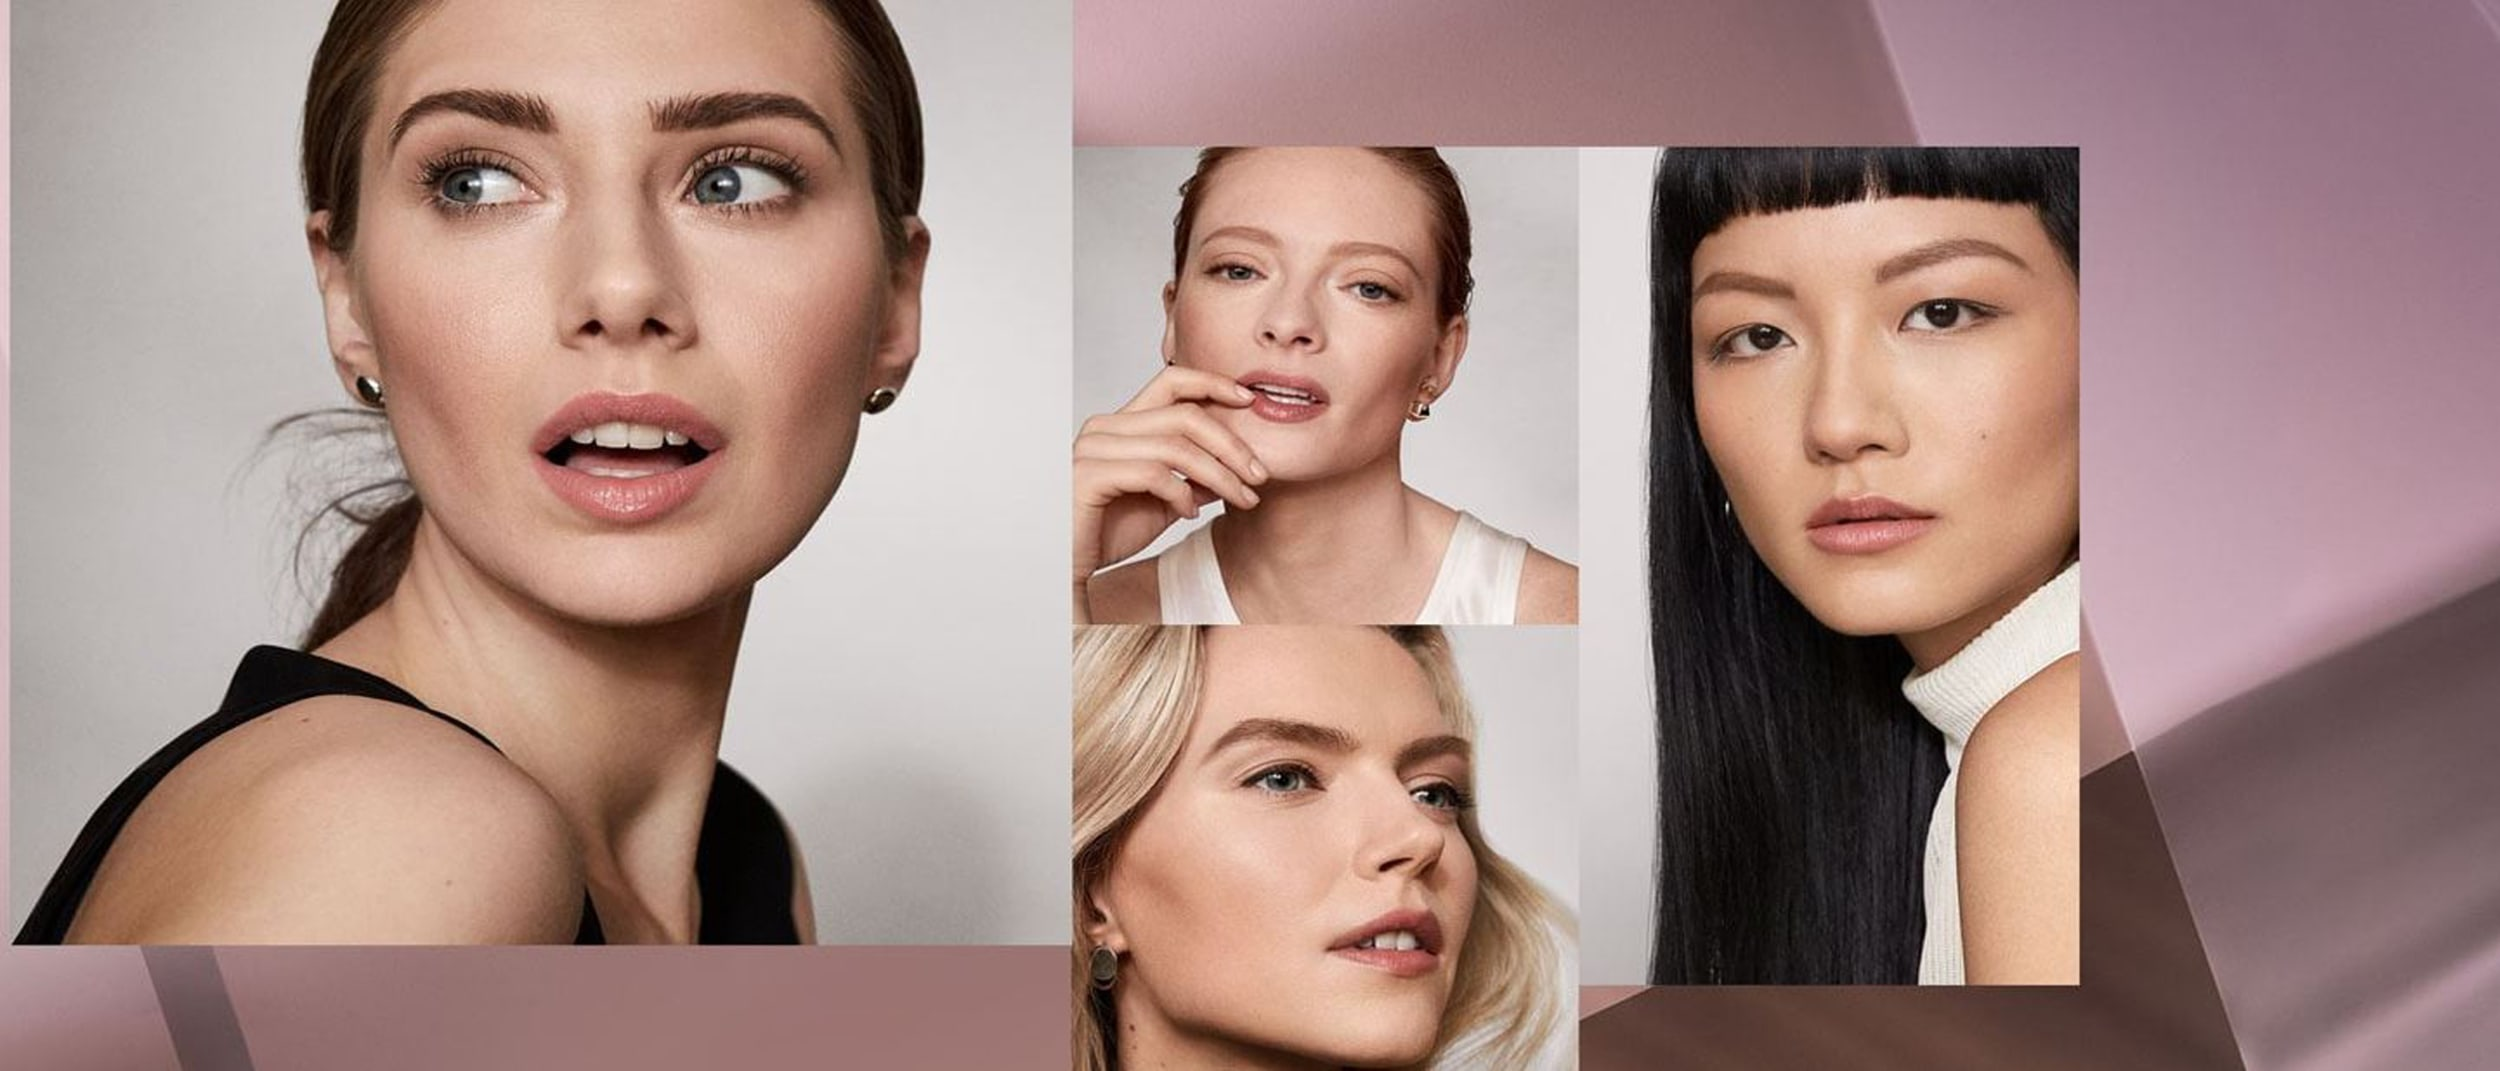 Brow & eye makeup tutorials at Bobbi Brown for Taste. Shop. Play.